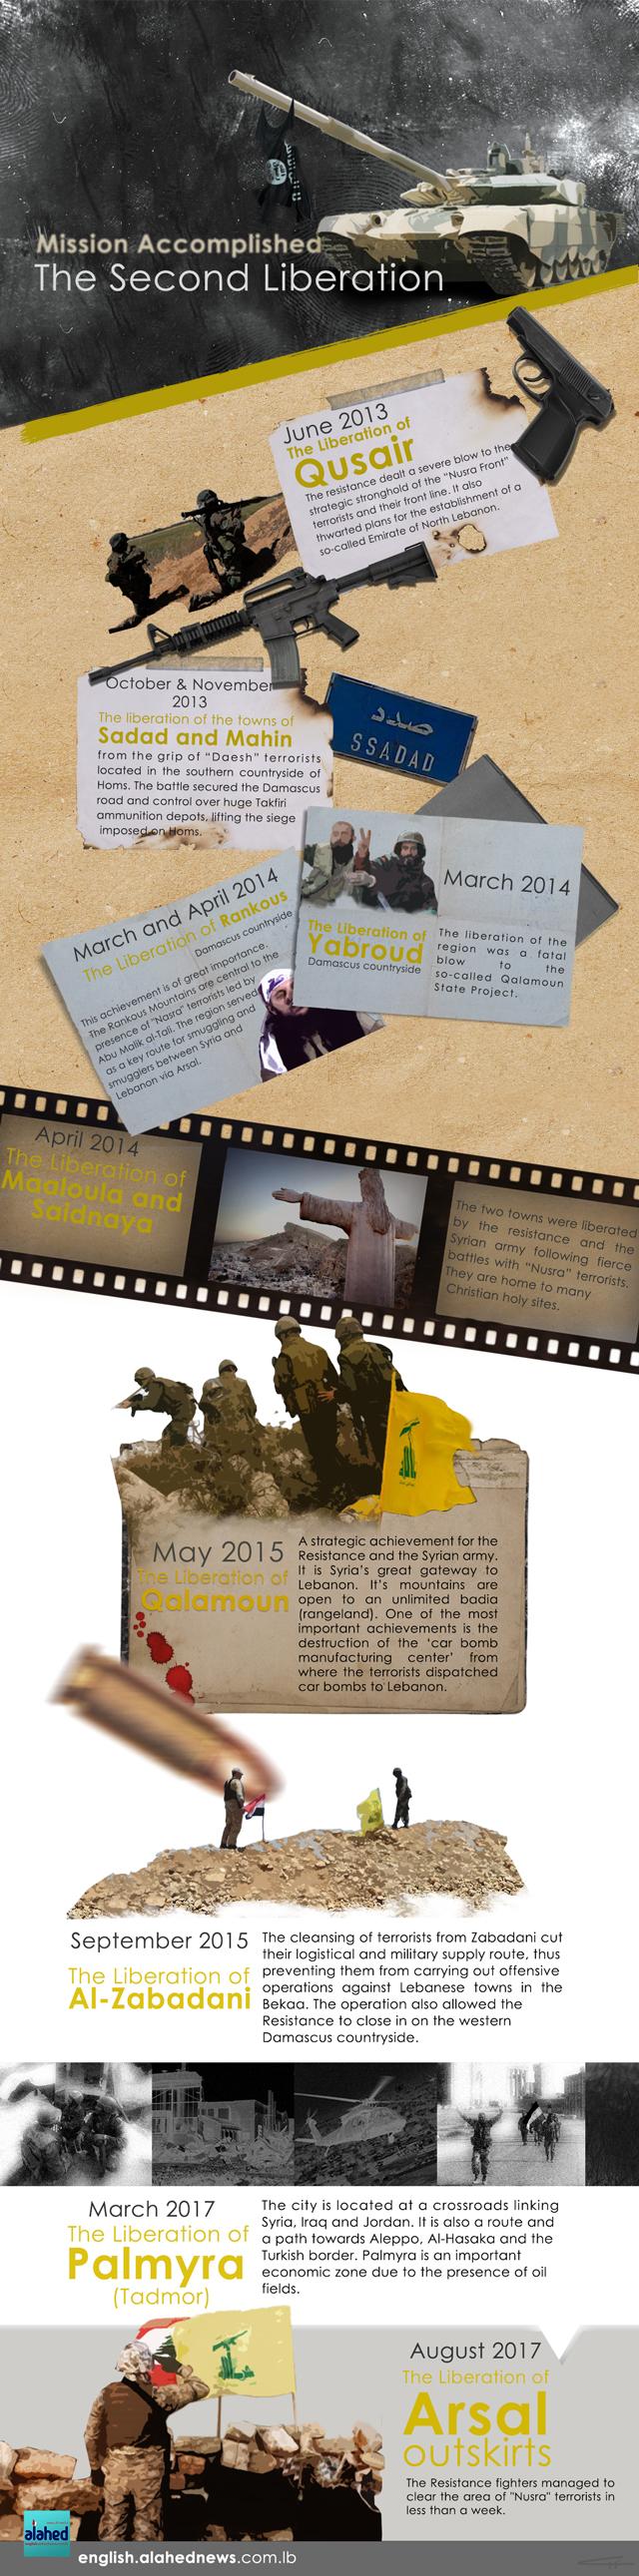 Lebanon's Second Liberation